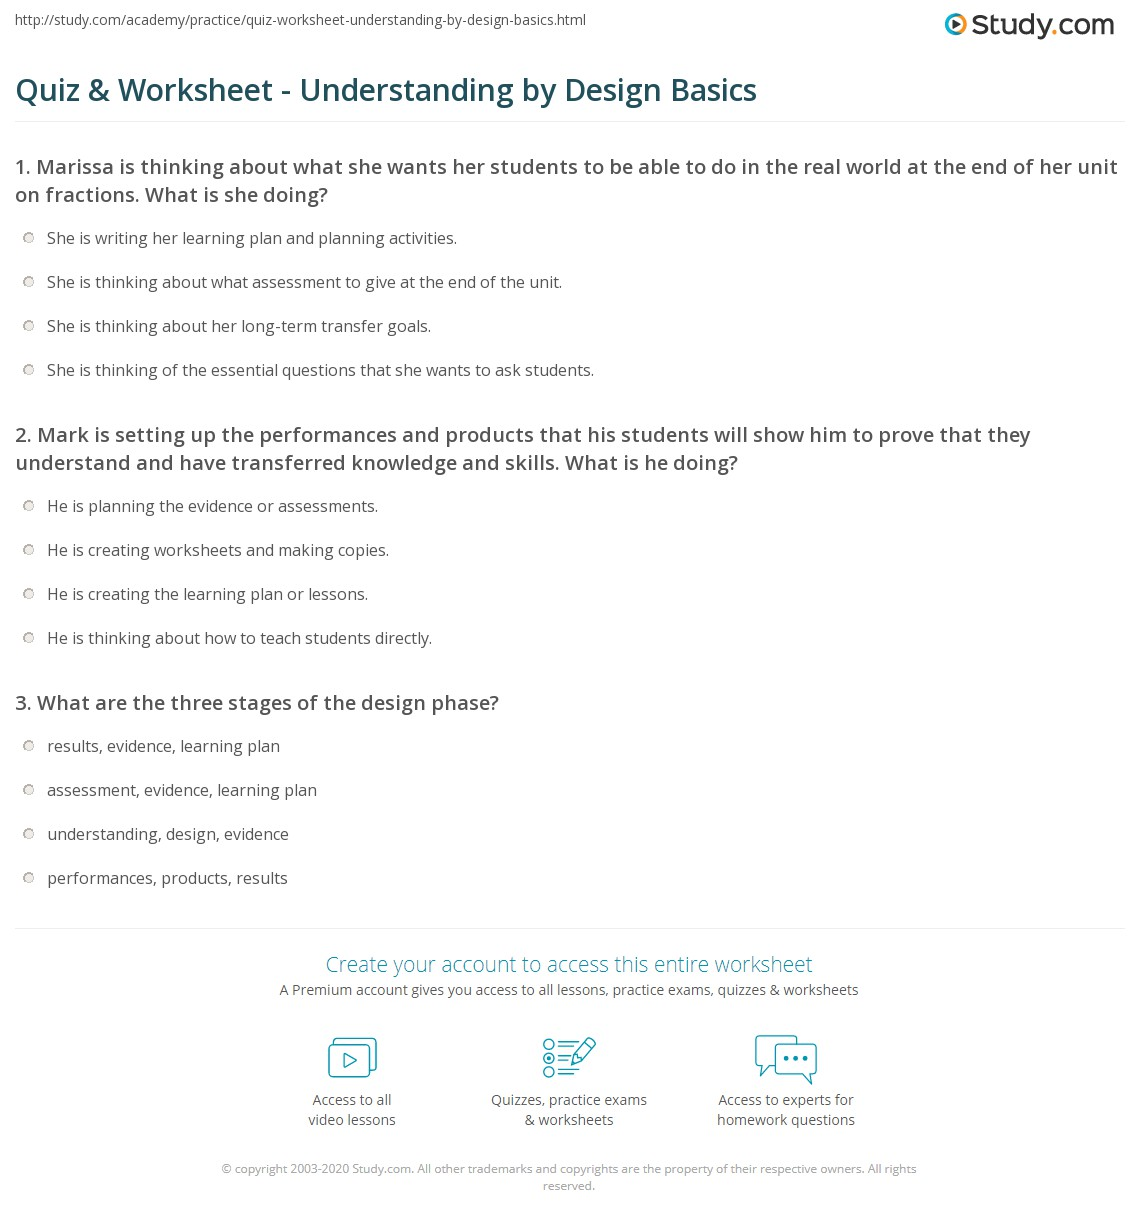 Energy transfer skills worksheet answers 1627226 ...